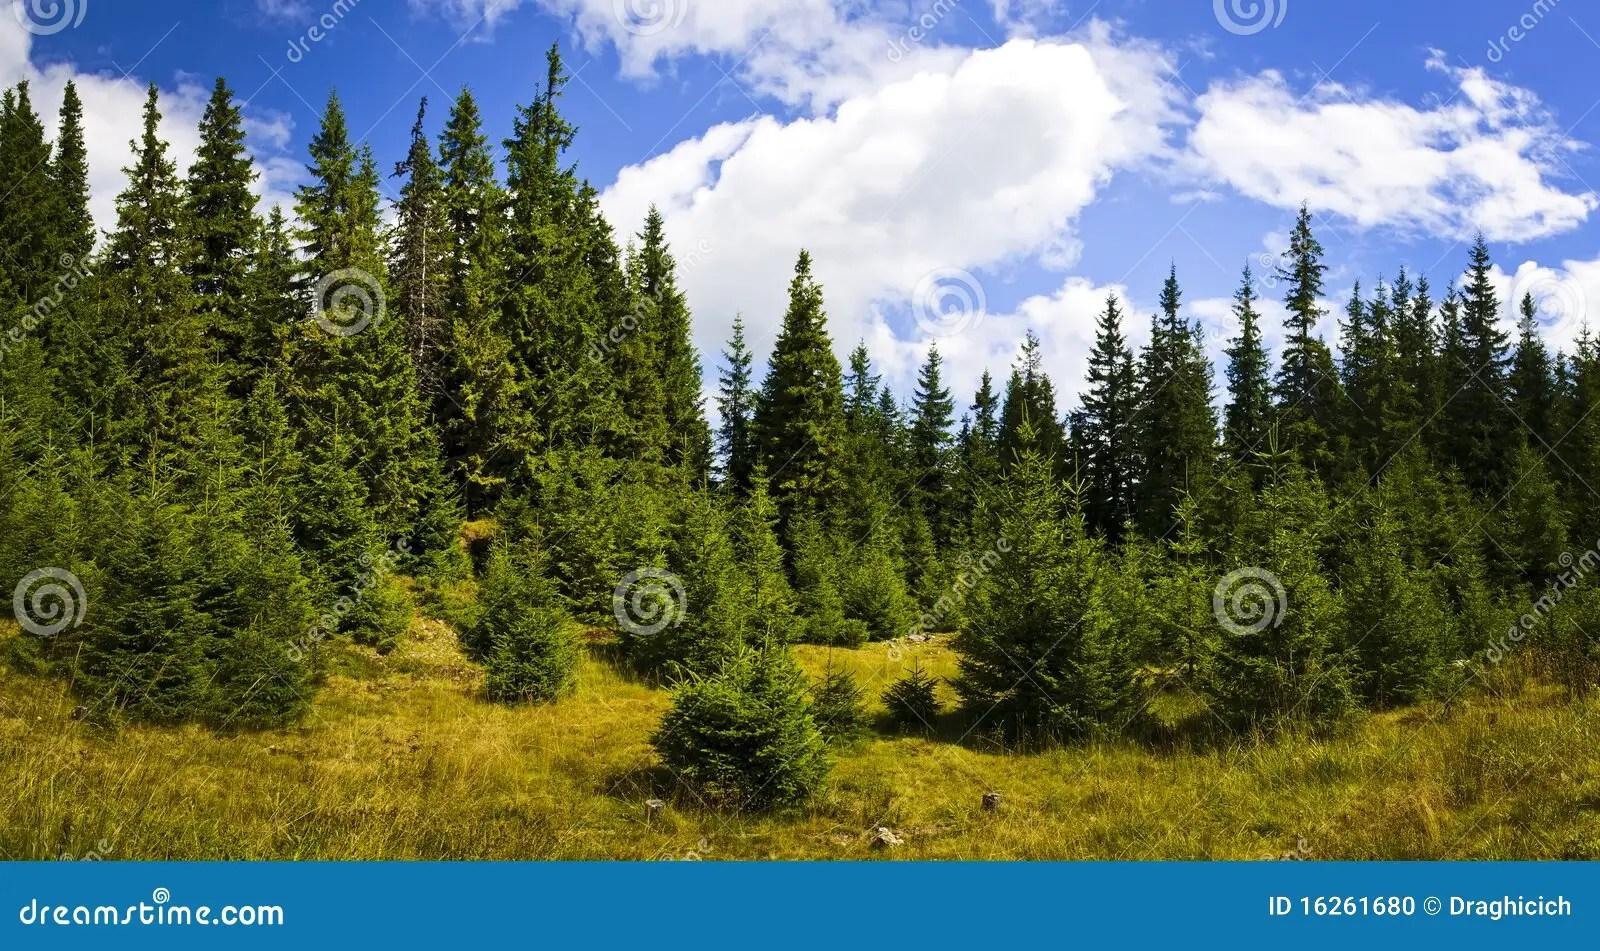 Pine Forest Landscape Stock Photo Image 16261680